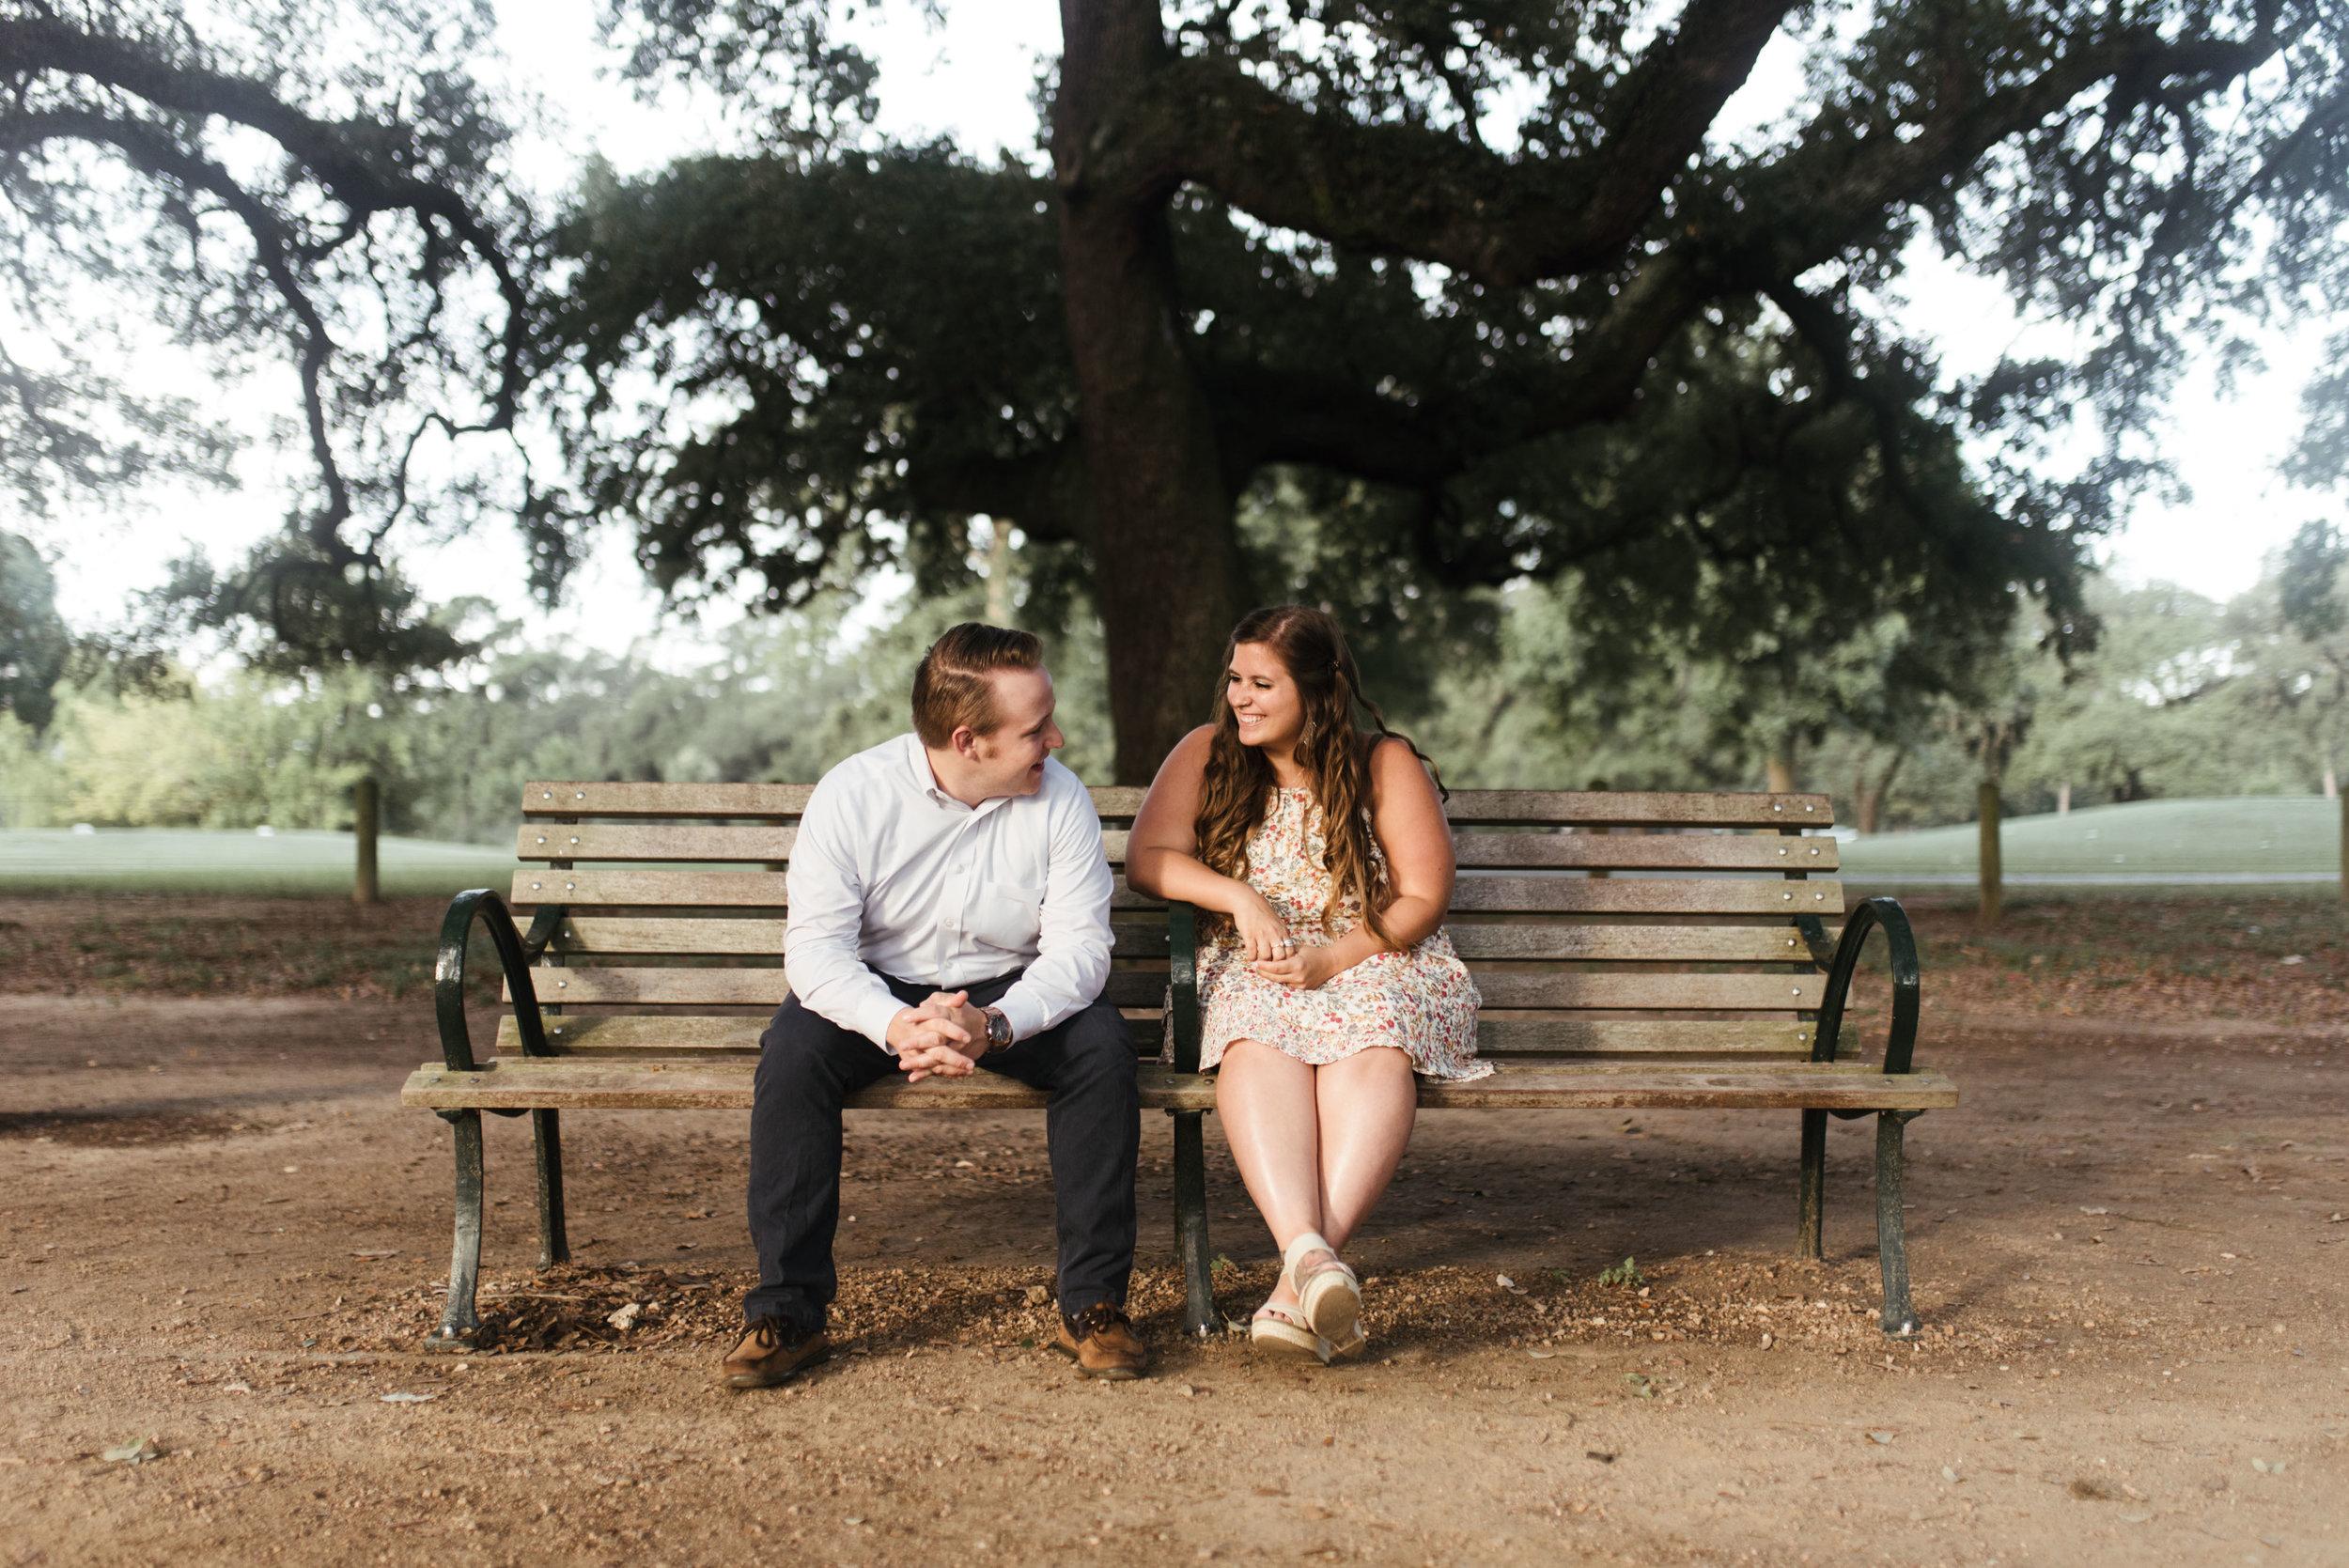 Hermann Park Engagement Session | Fort Worth Wedding Photographer | Jordan Mitchell Photography | www.jordanmitchellphotography.com